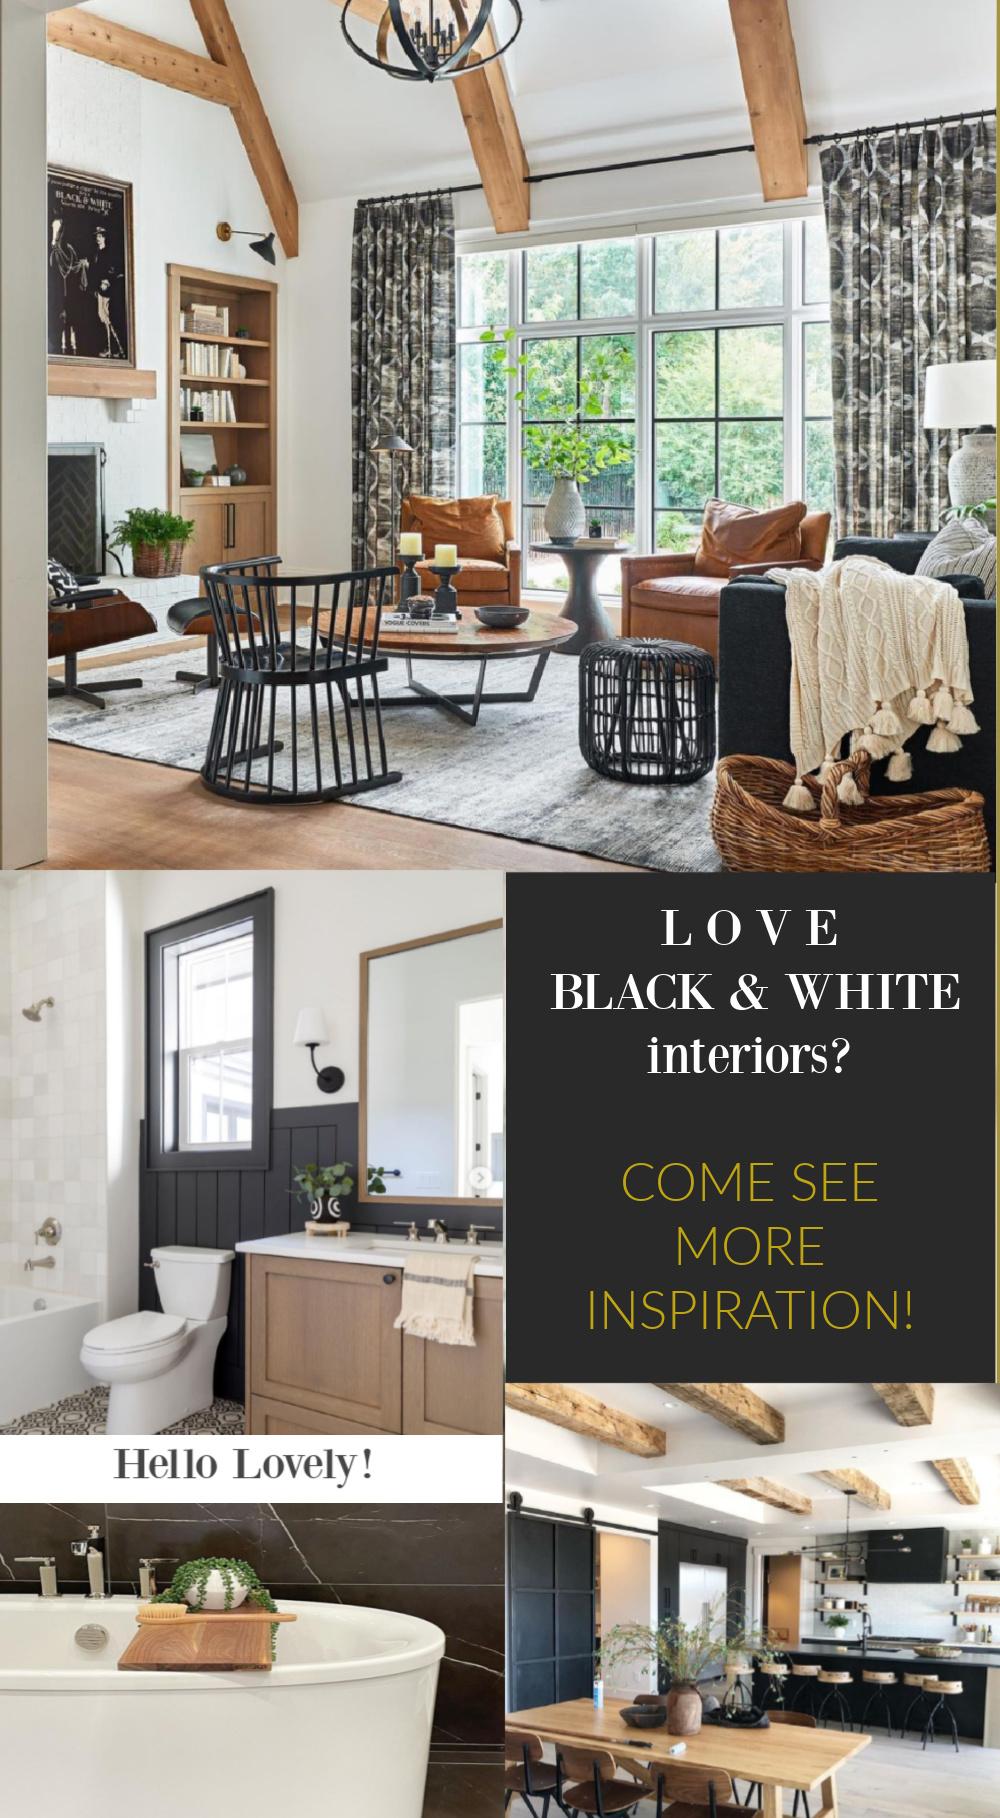 Black and white interiors inspiration on hello lovely studio. #blackandwhite #interiordesign #decoratingideas